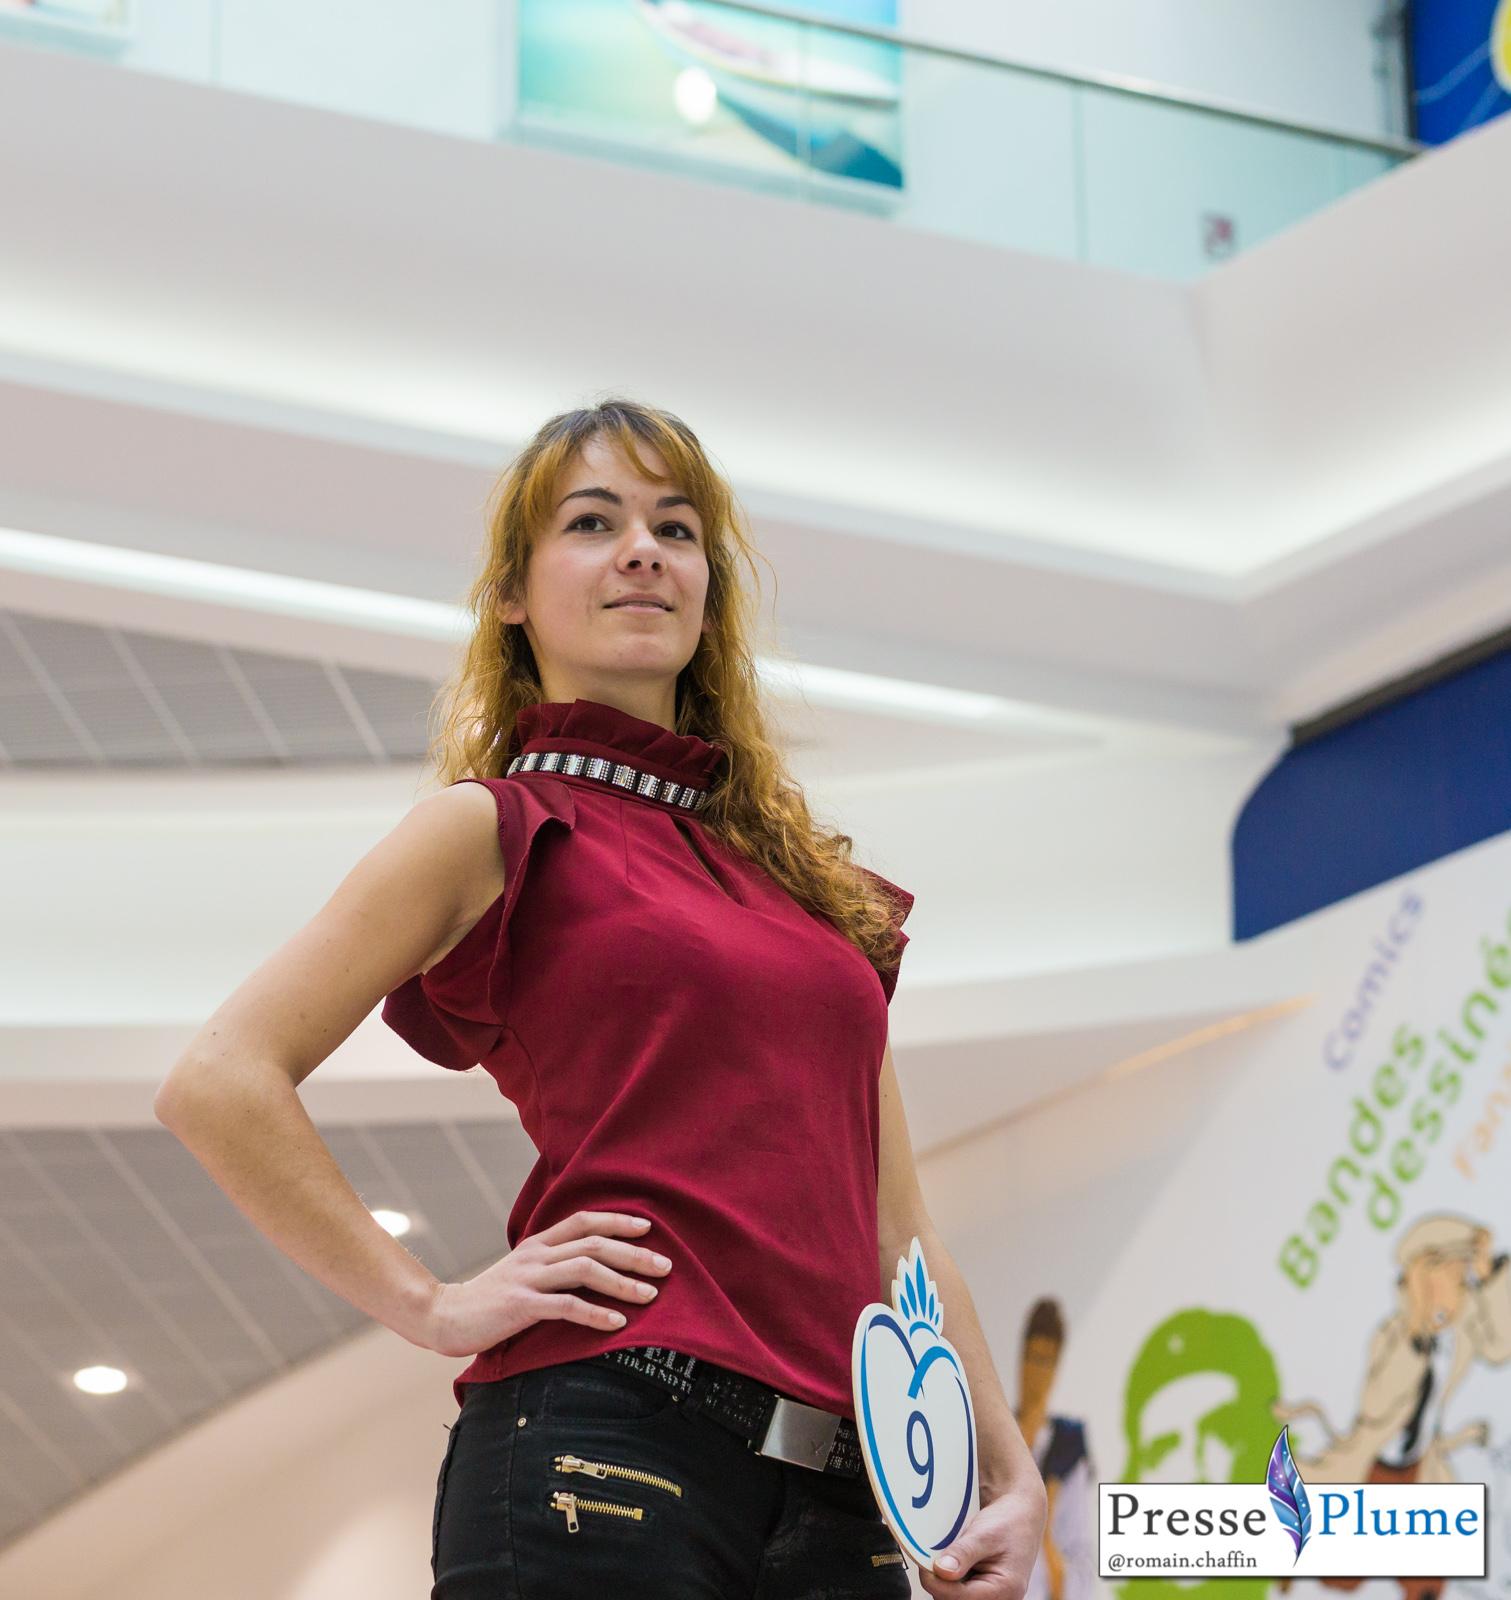 Sad I Miss You Quotes For Friends: Élection Miss Nantes 2016 Galerie Océane